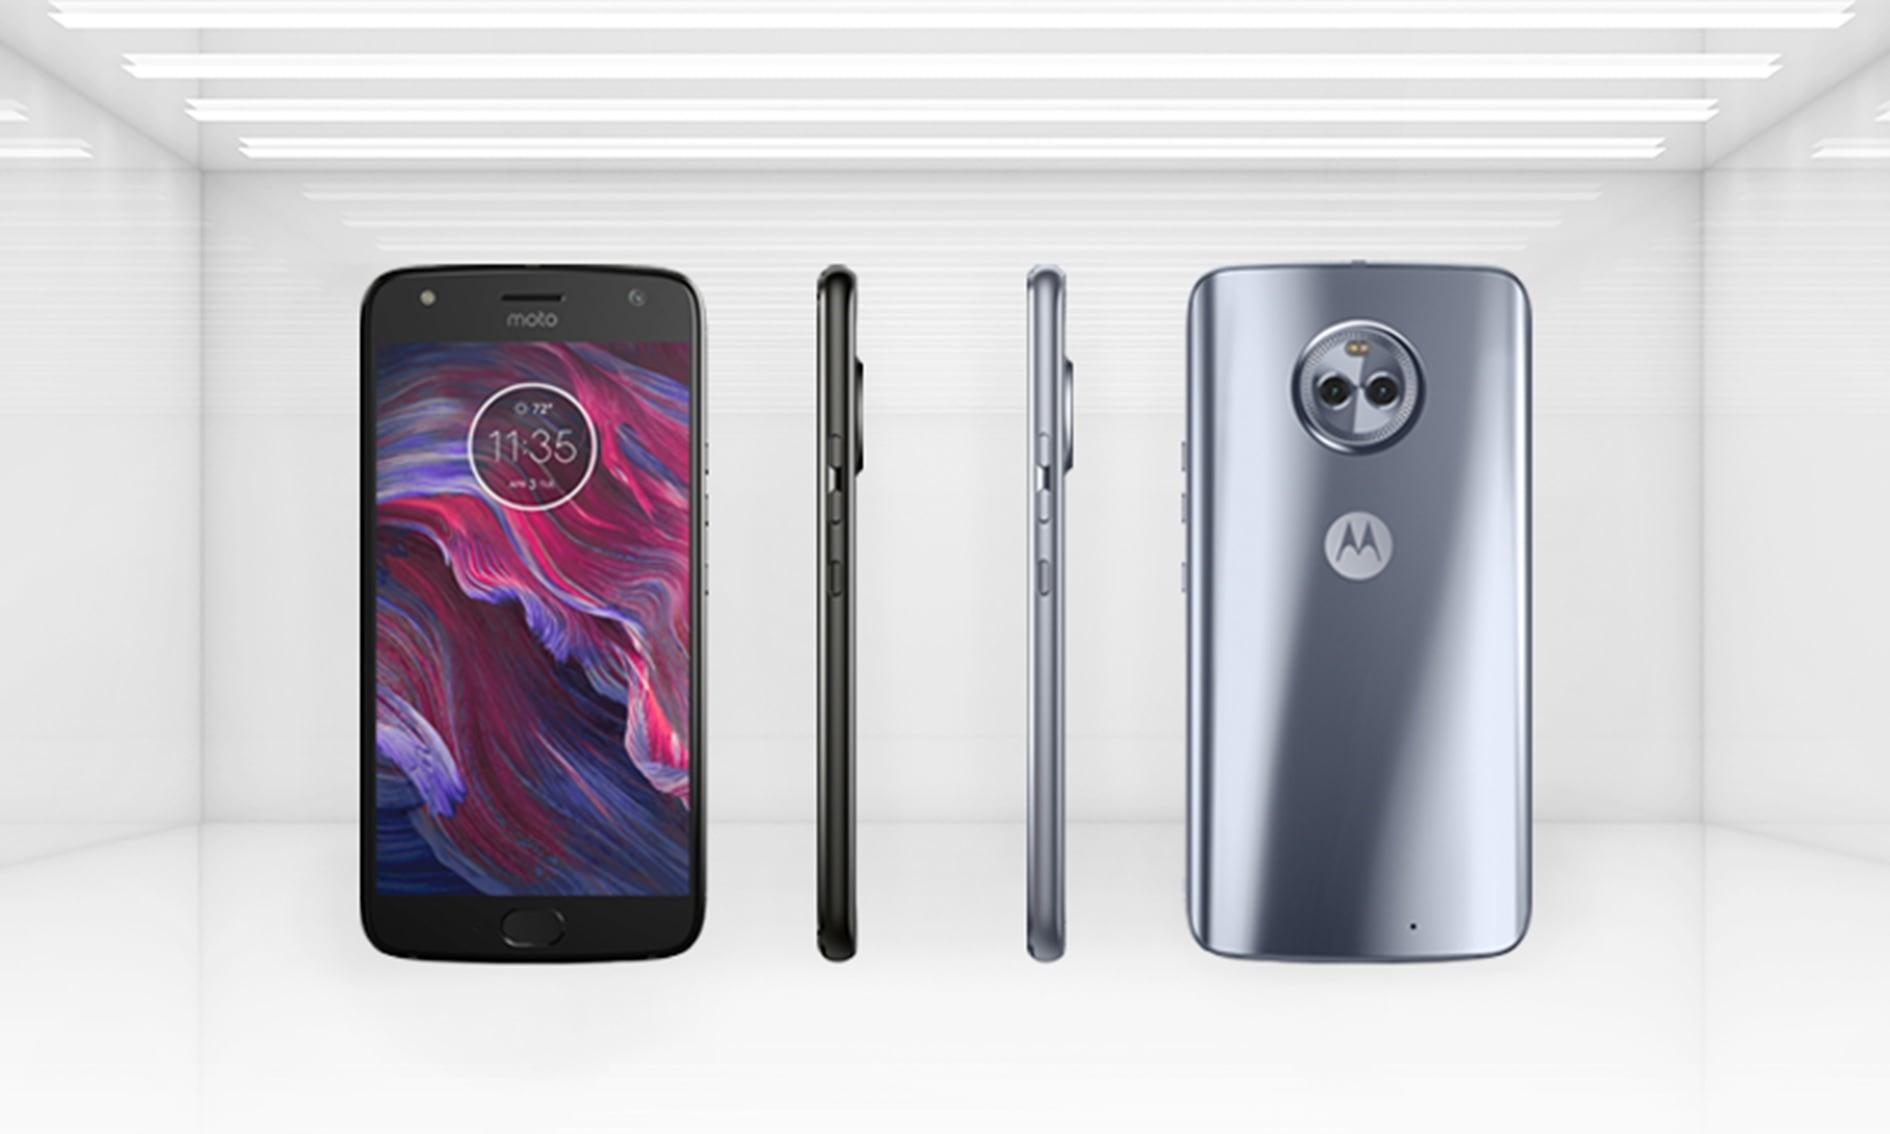 https://www.tabletowo.pl/wp-content/uploads/2017/08/Motorola-Moto-X4-fot.-Motorola.jpg